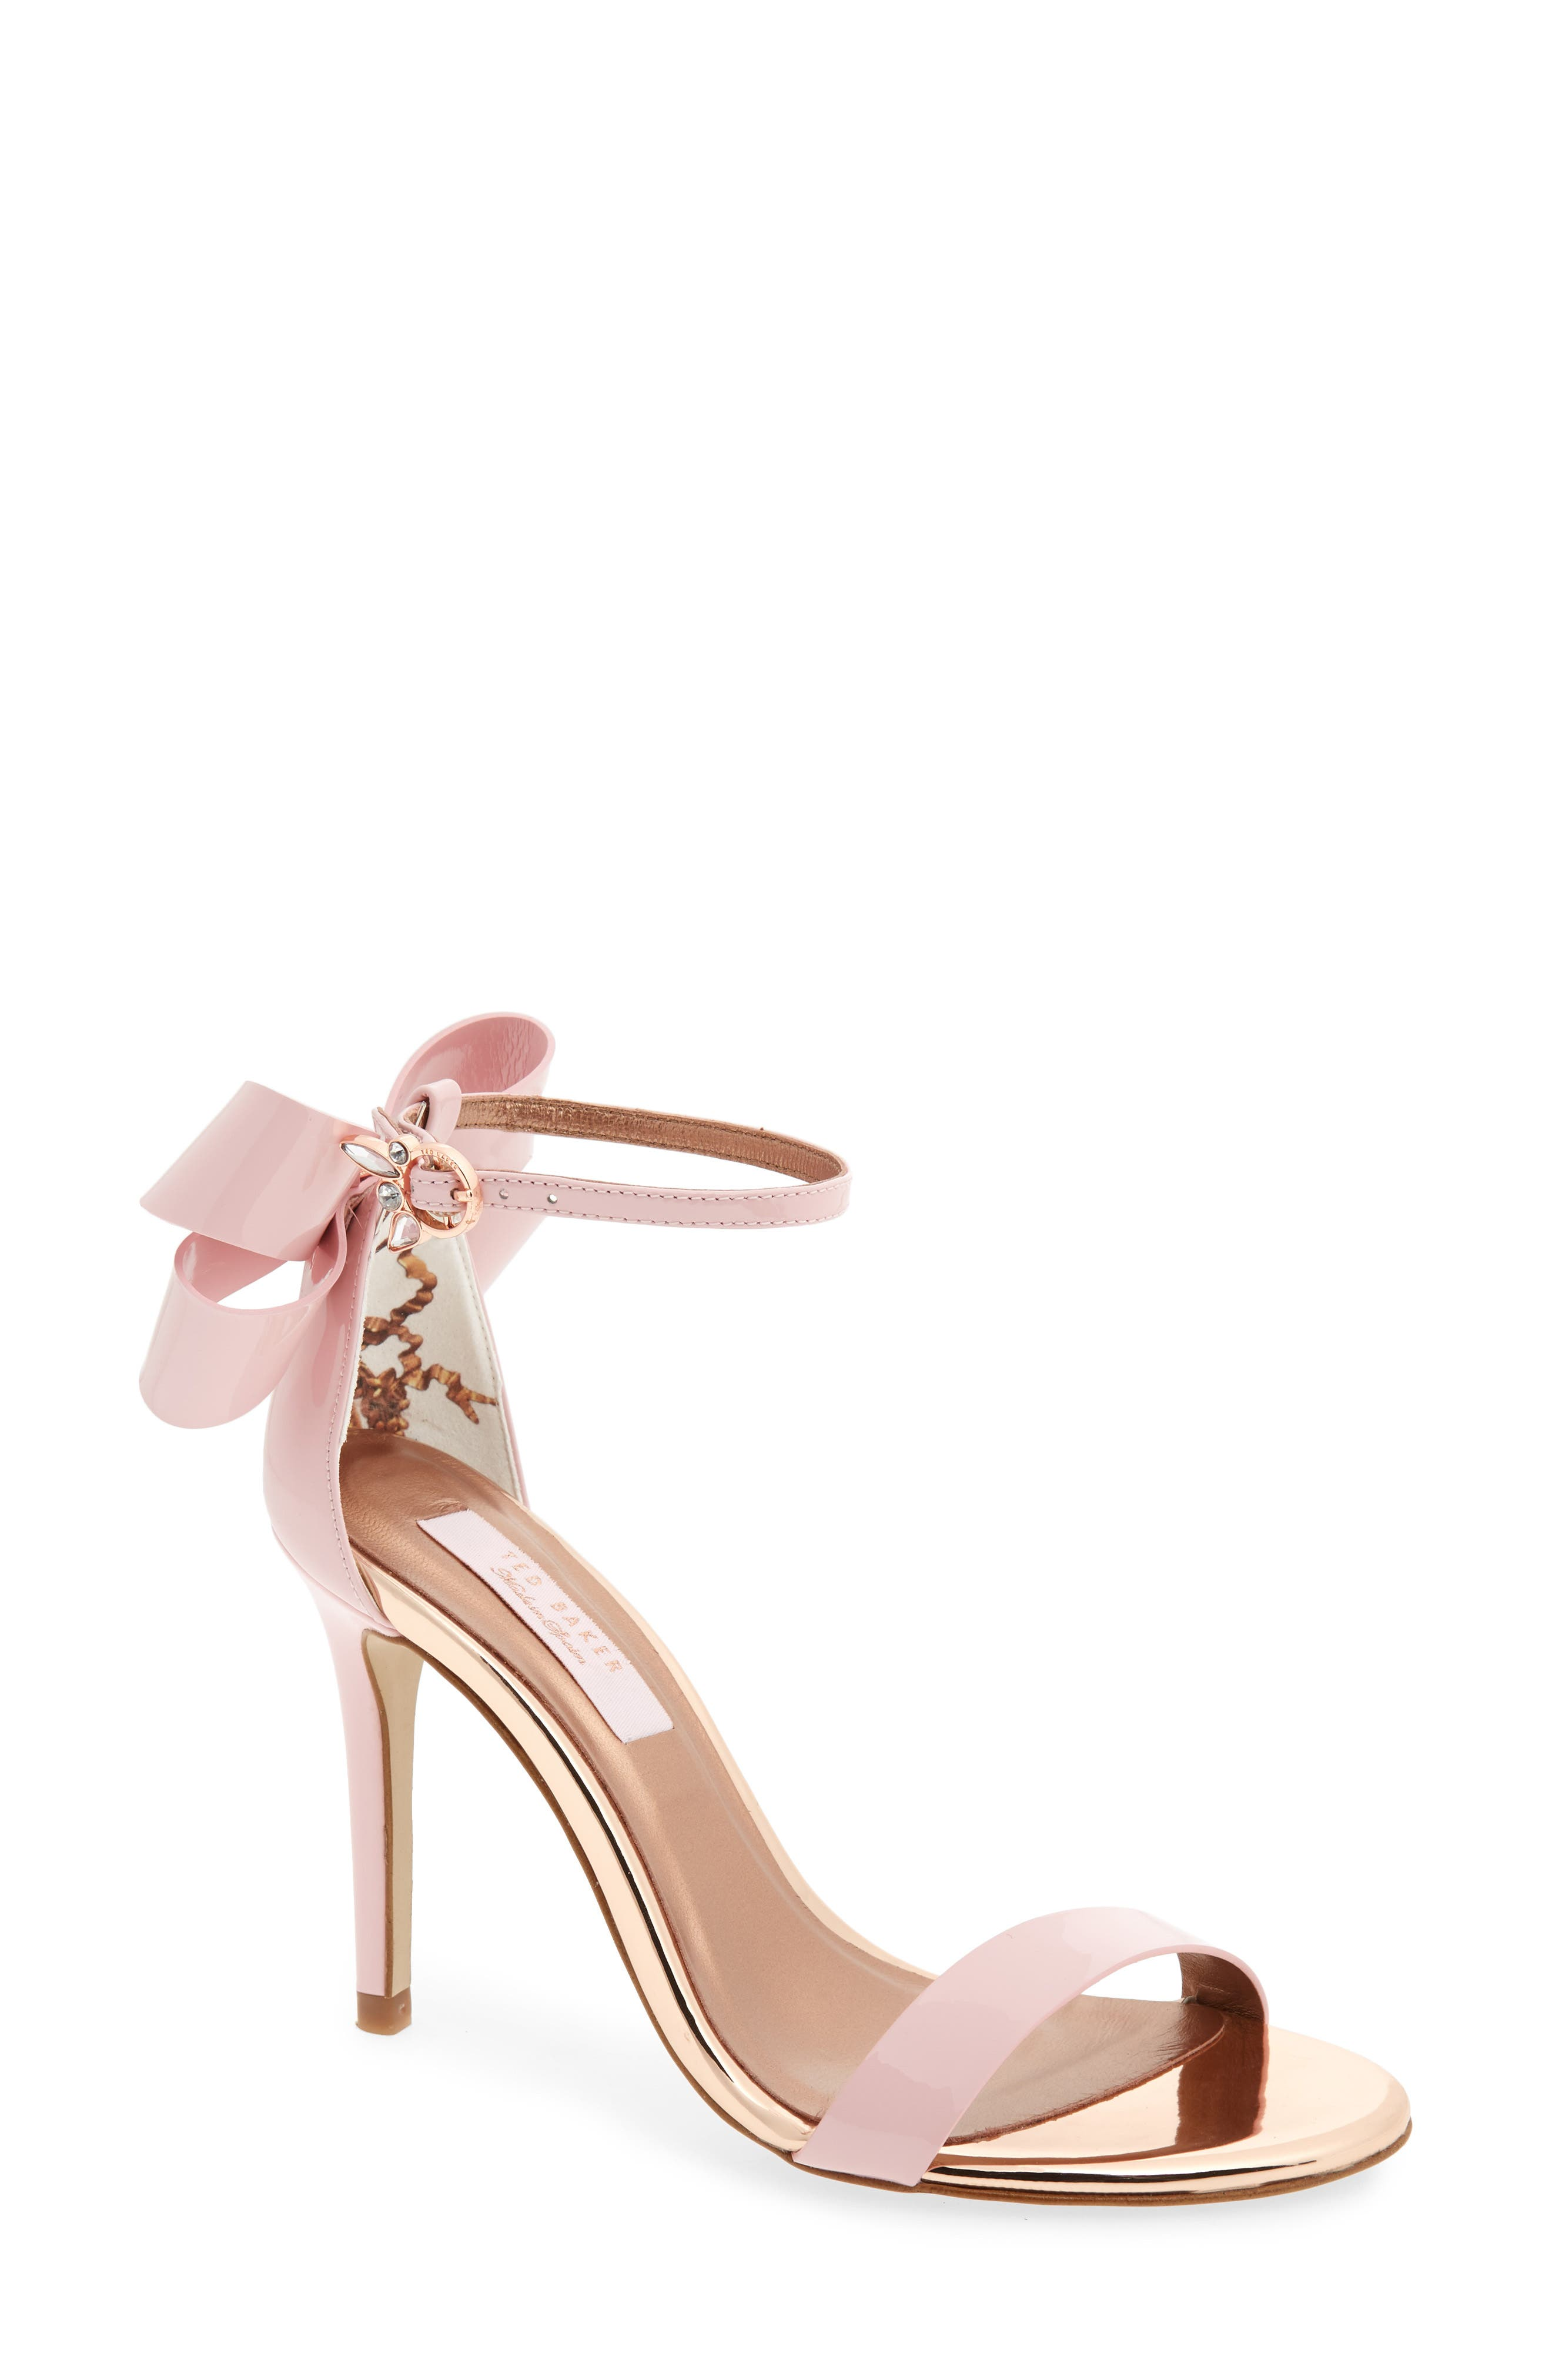 Sandalo Sandal,                             Main thumbnail 1, color,                             Light Pink Leather